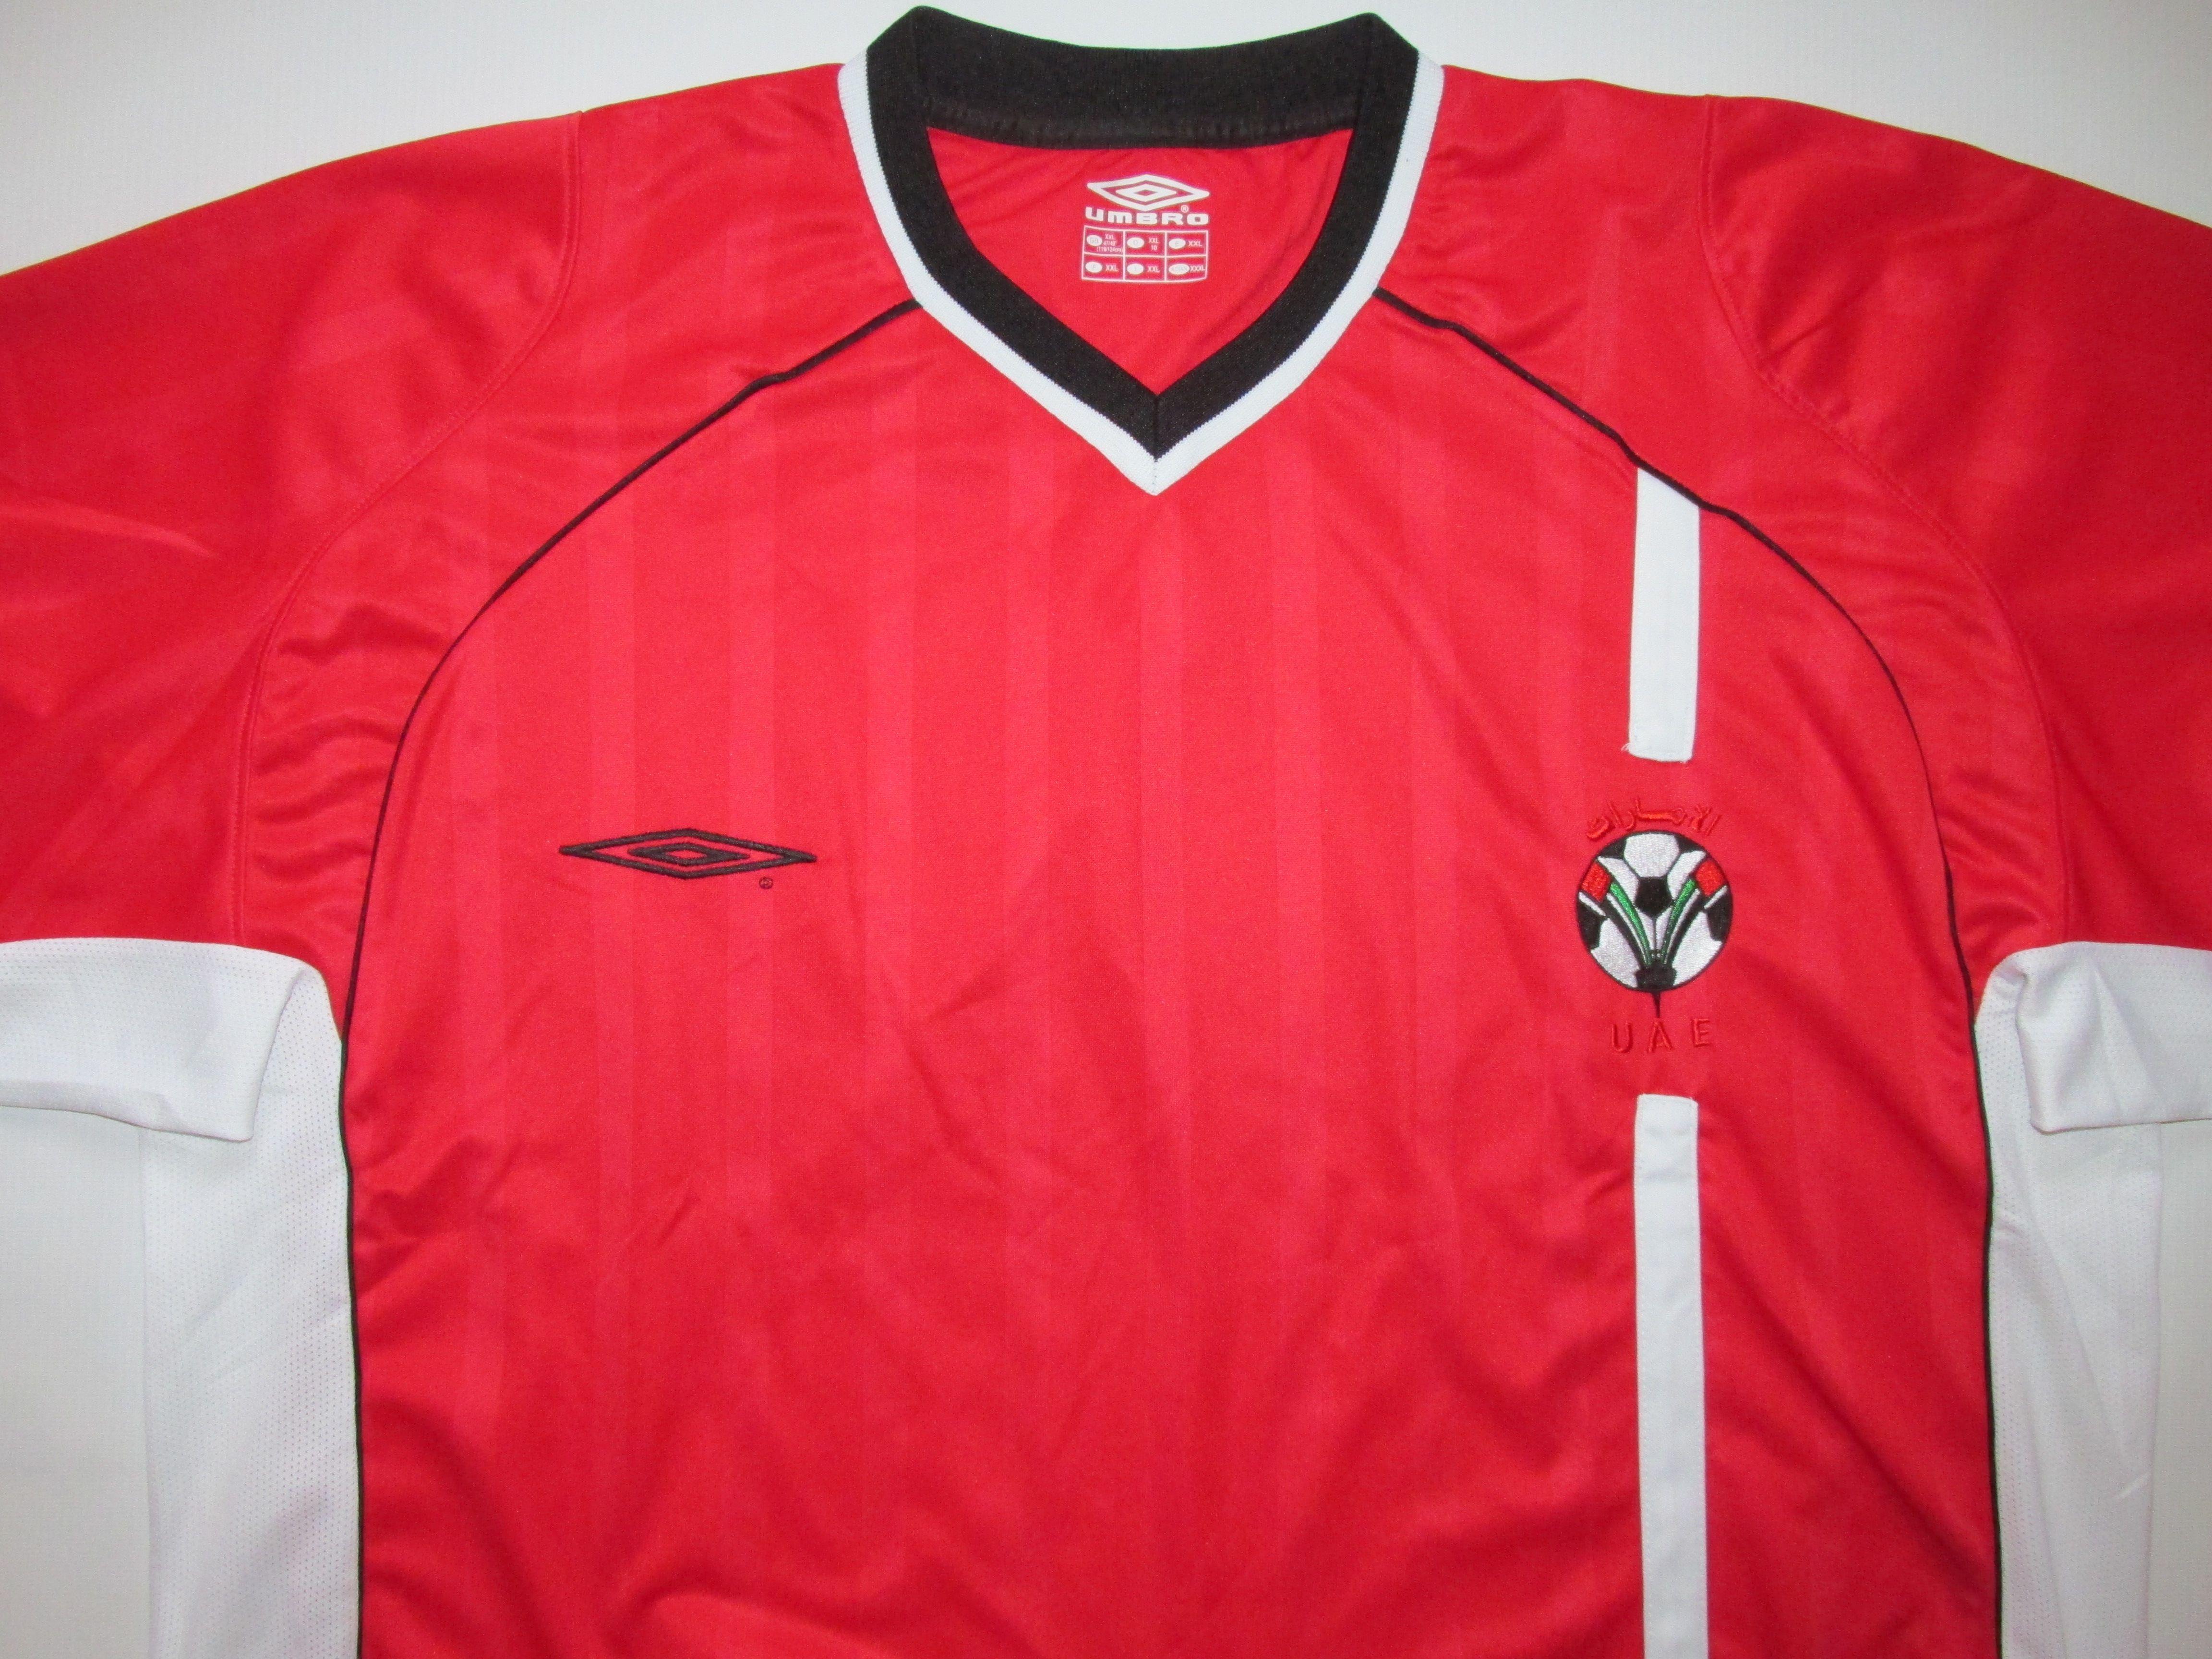 uae united arab emirates 2002 2004 away football shirt by umbro afc jersey soccer vintage